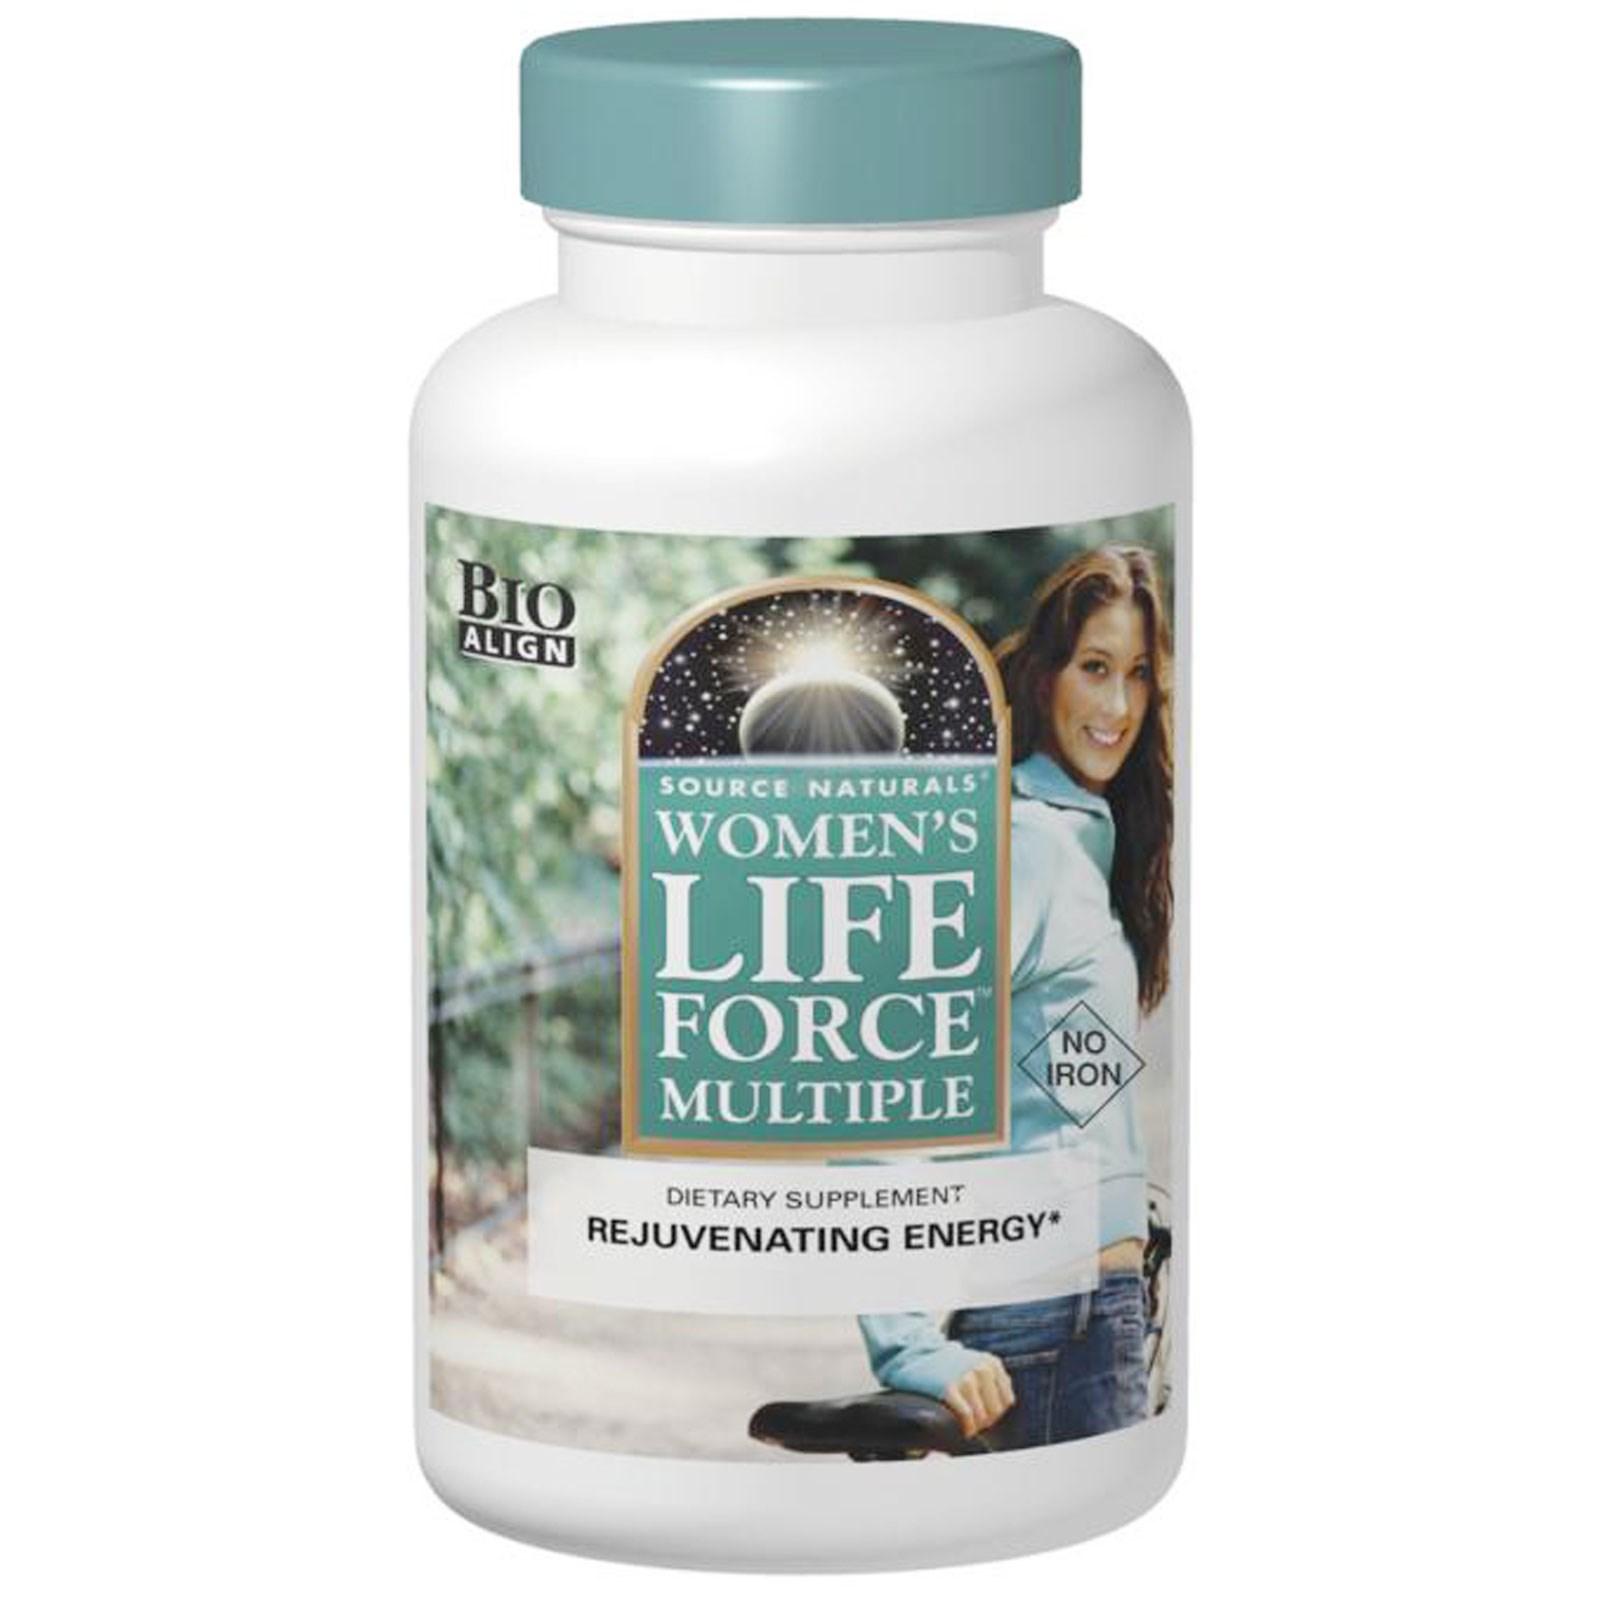 Source Naturals, Жизненная сила для женщин, без железа, 90 таблеток